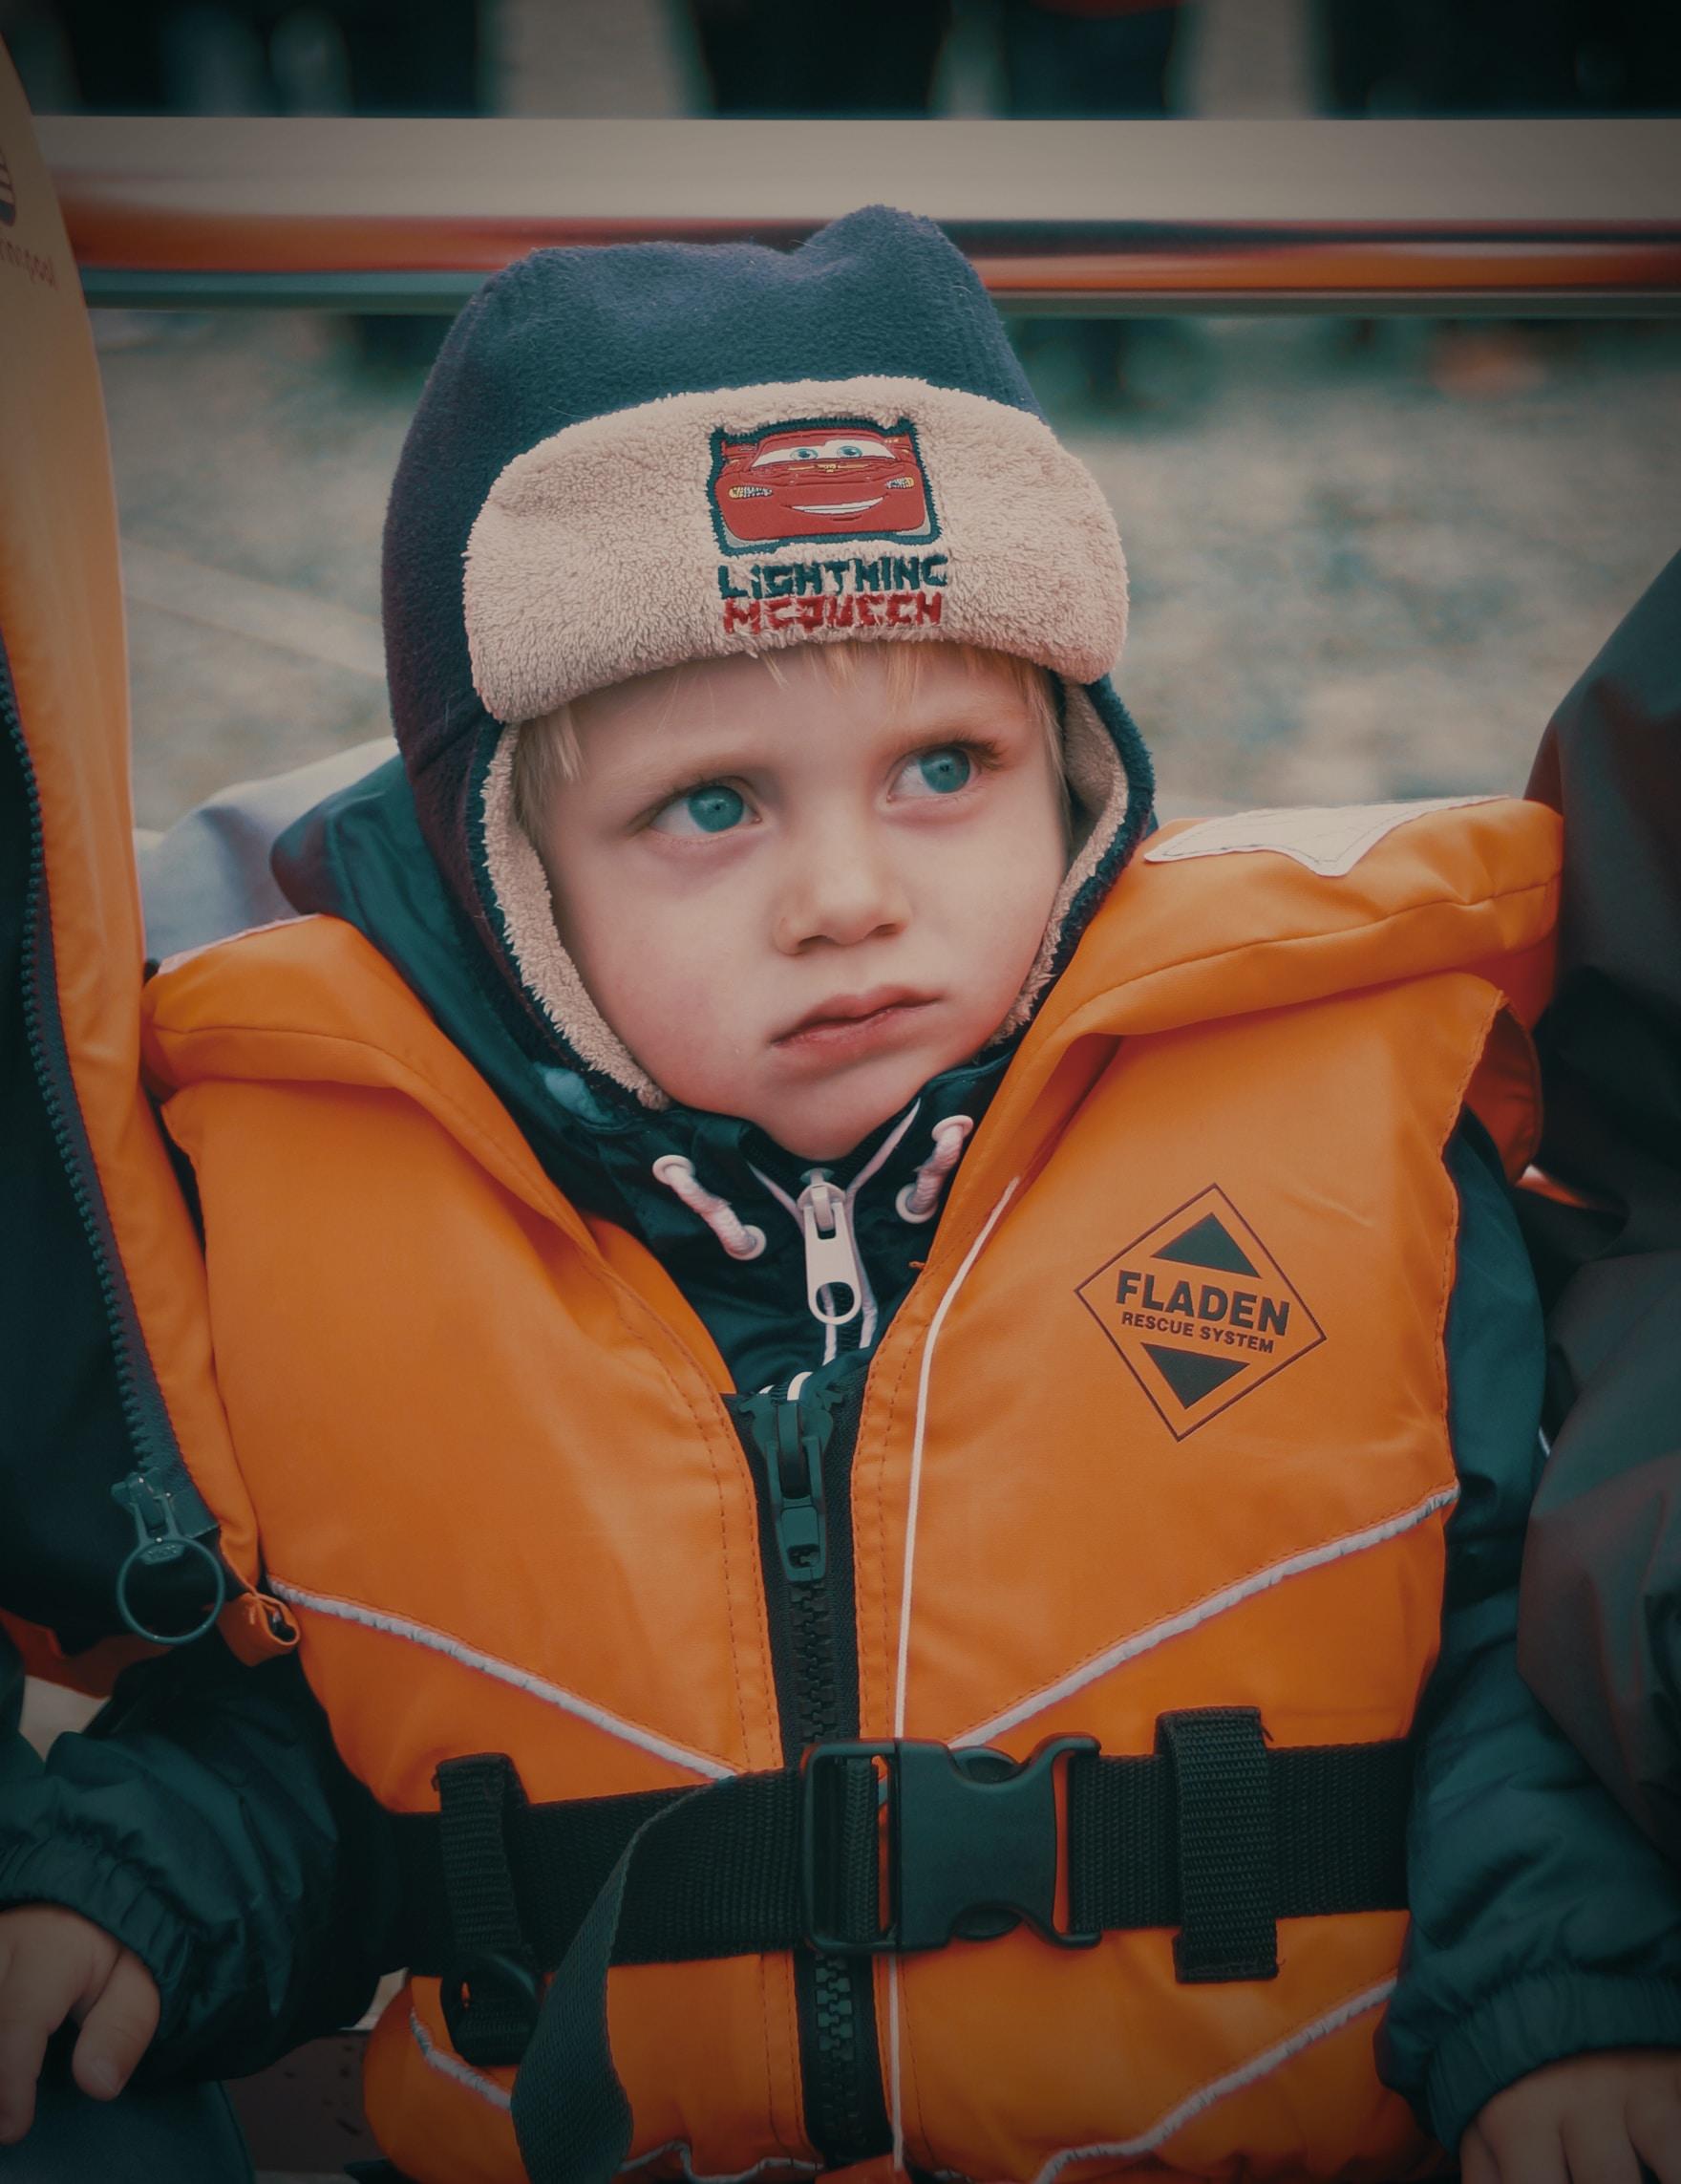 child wearing orange life vest